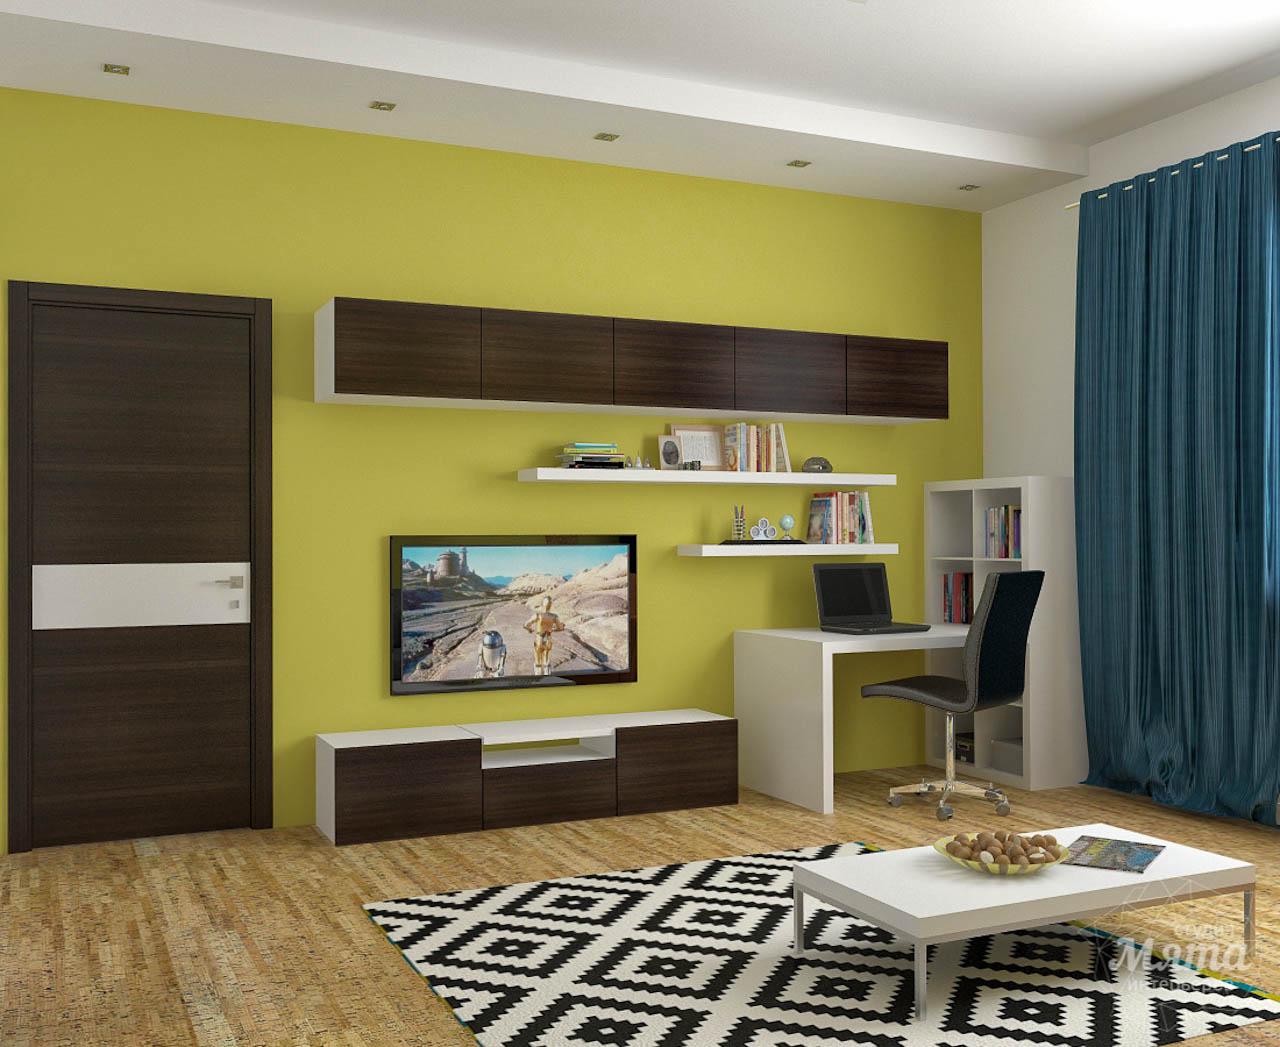 Дизайн проект интерьера коттеджа  в стиле минимализм по ул. Барвинка 15 img494267714